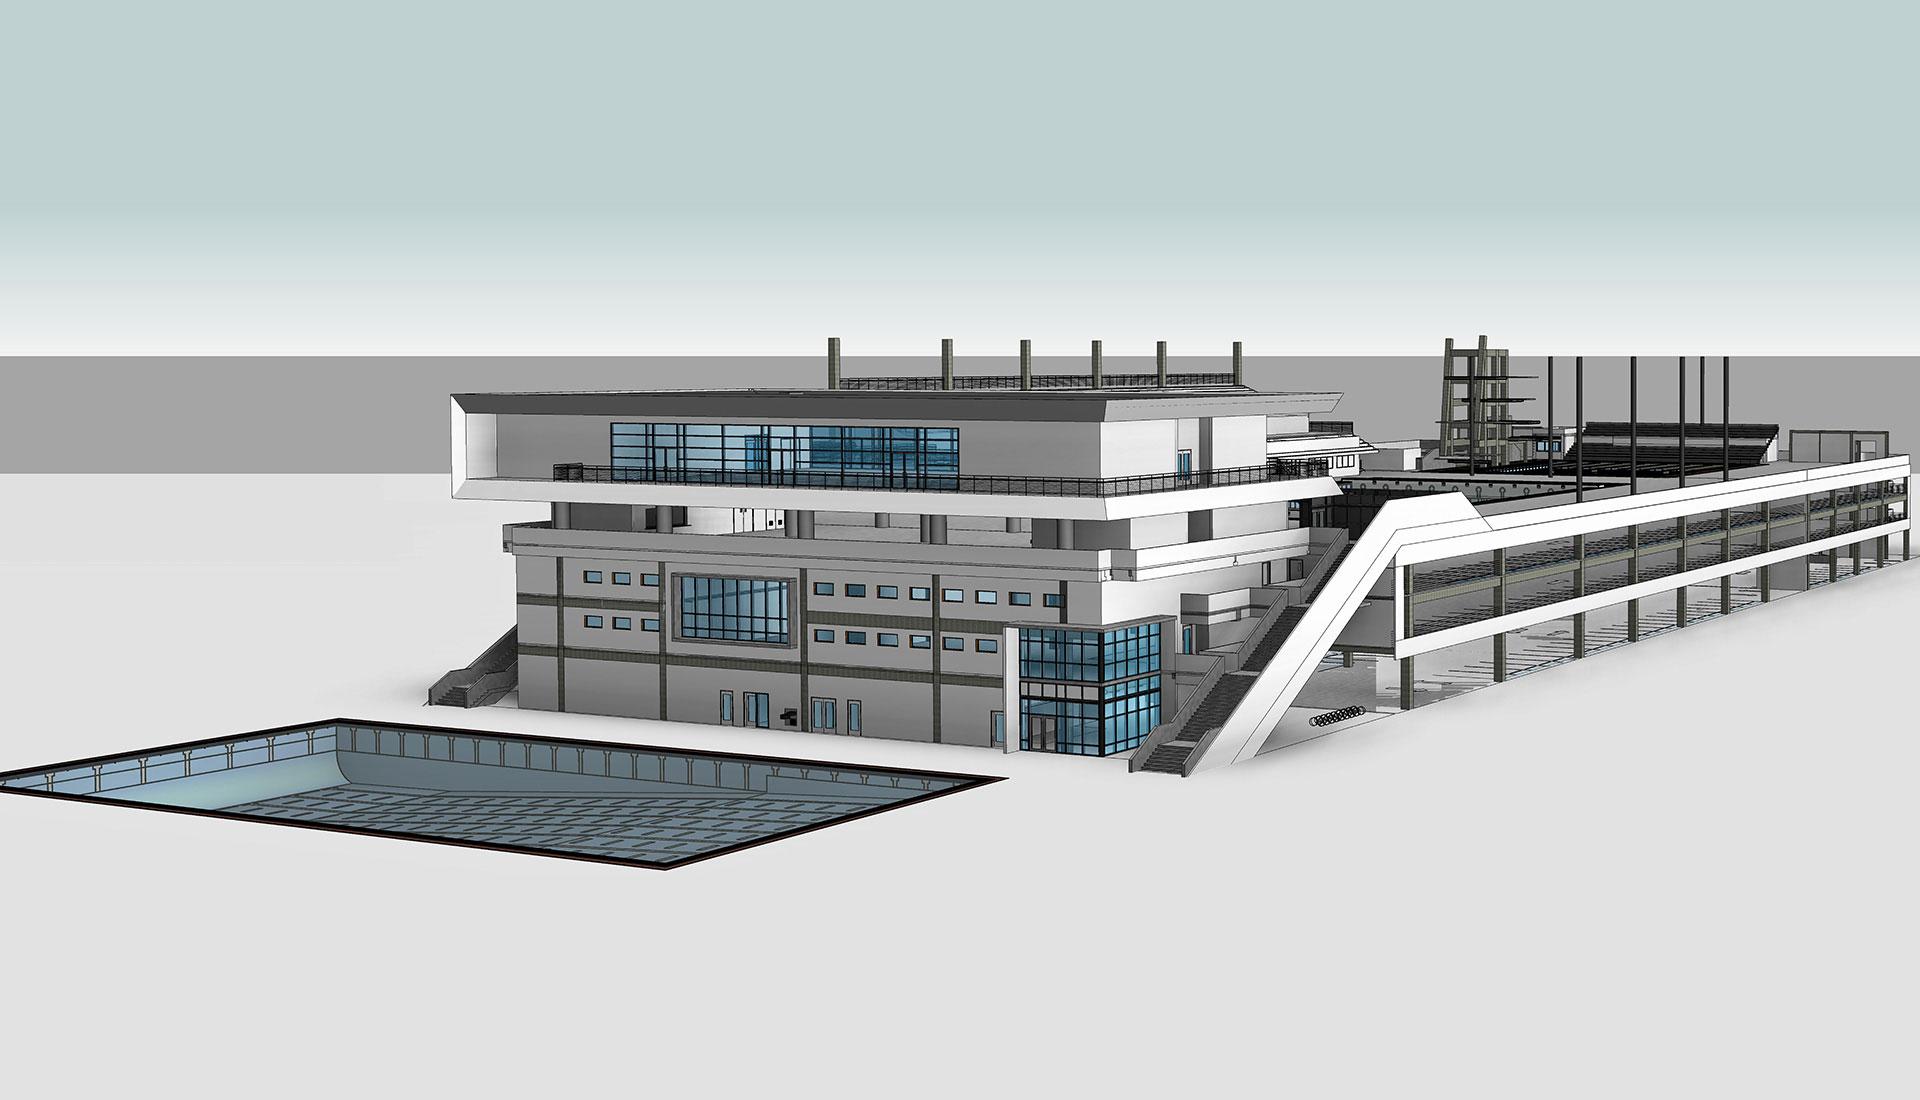 3D-Architectural-BIM-Model-Commercial-Revit-Modeling-by-United-BIM